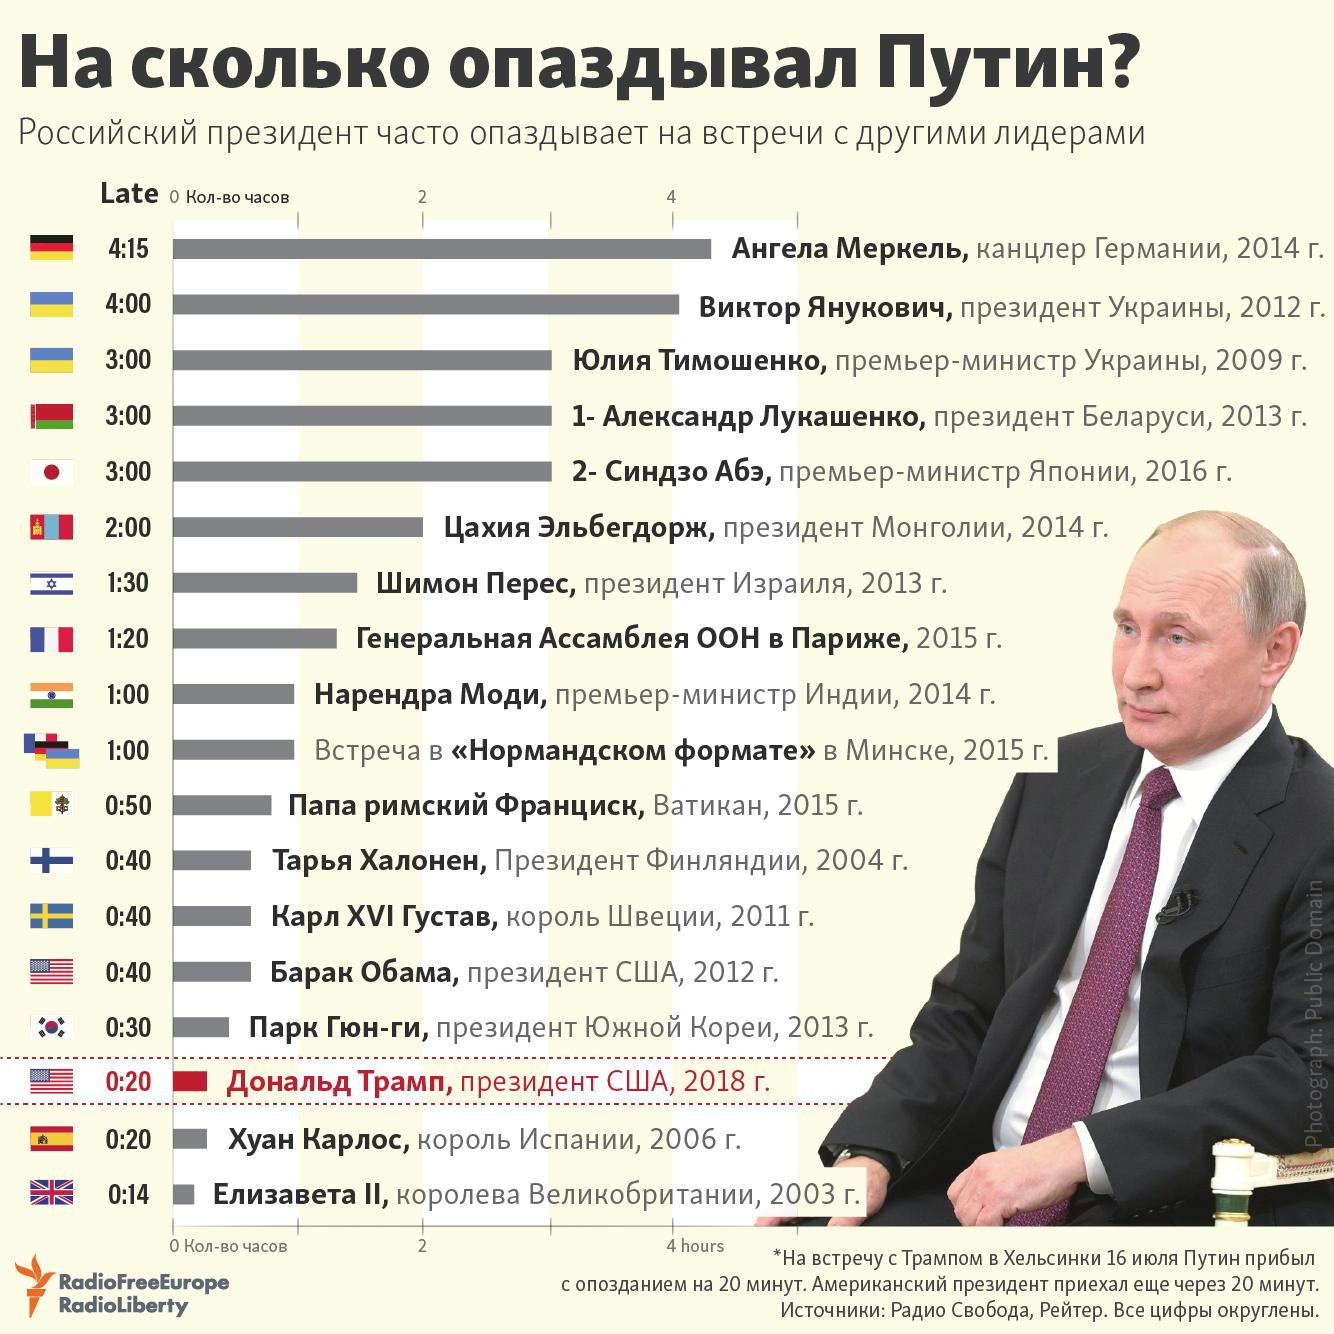 Почему Путин опаздывает на встречи фото